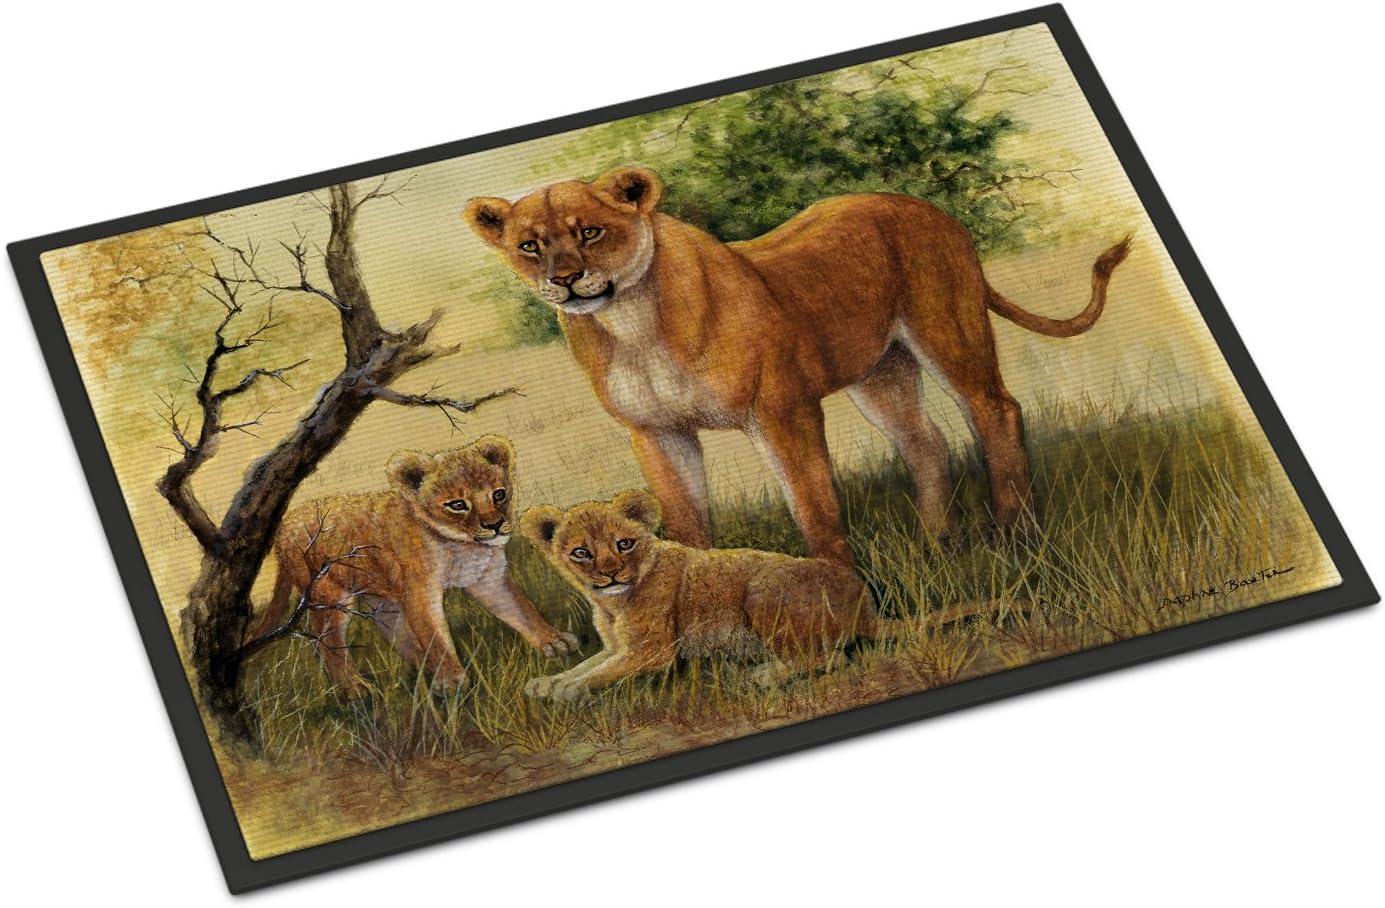 Amazon Com Caroline S Treasures Bdba0307mat Lion And Cubs By Daphne Baxter Indoor Or Outdoor Mat 18x27 18h X 27w Multicolor Caroline S Treasures Home Kitchen